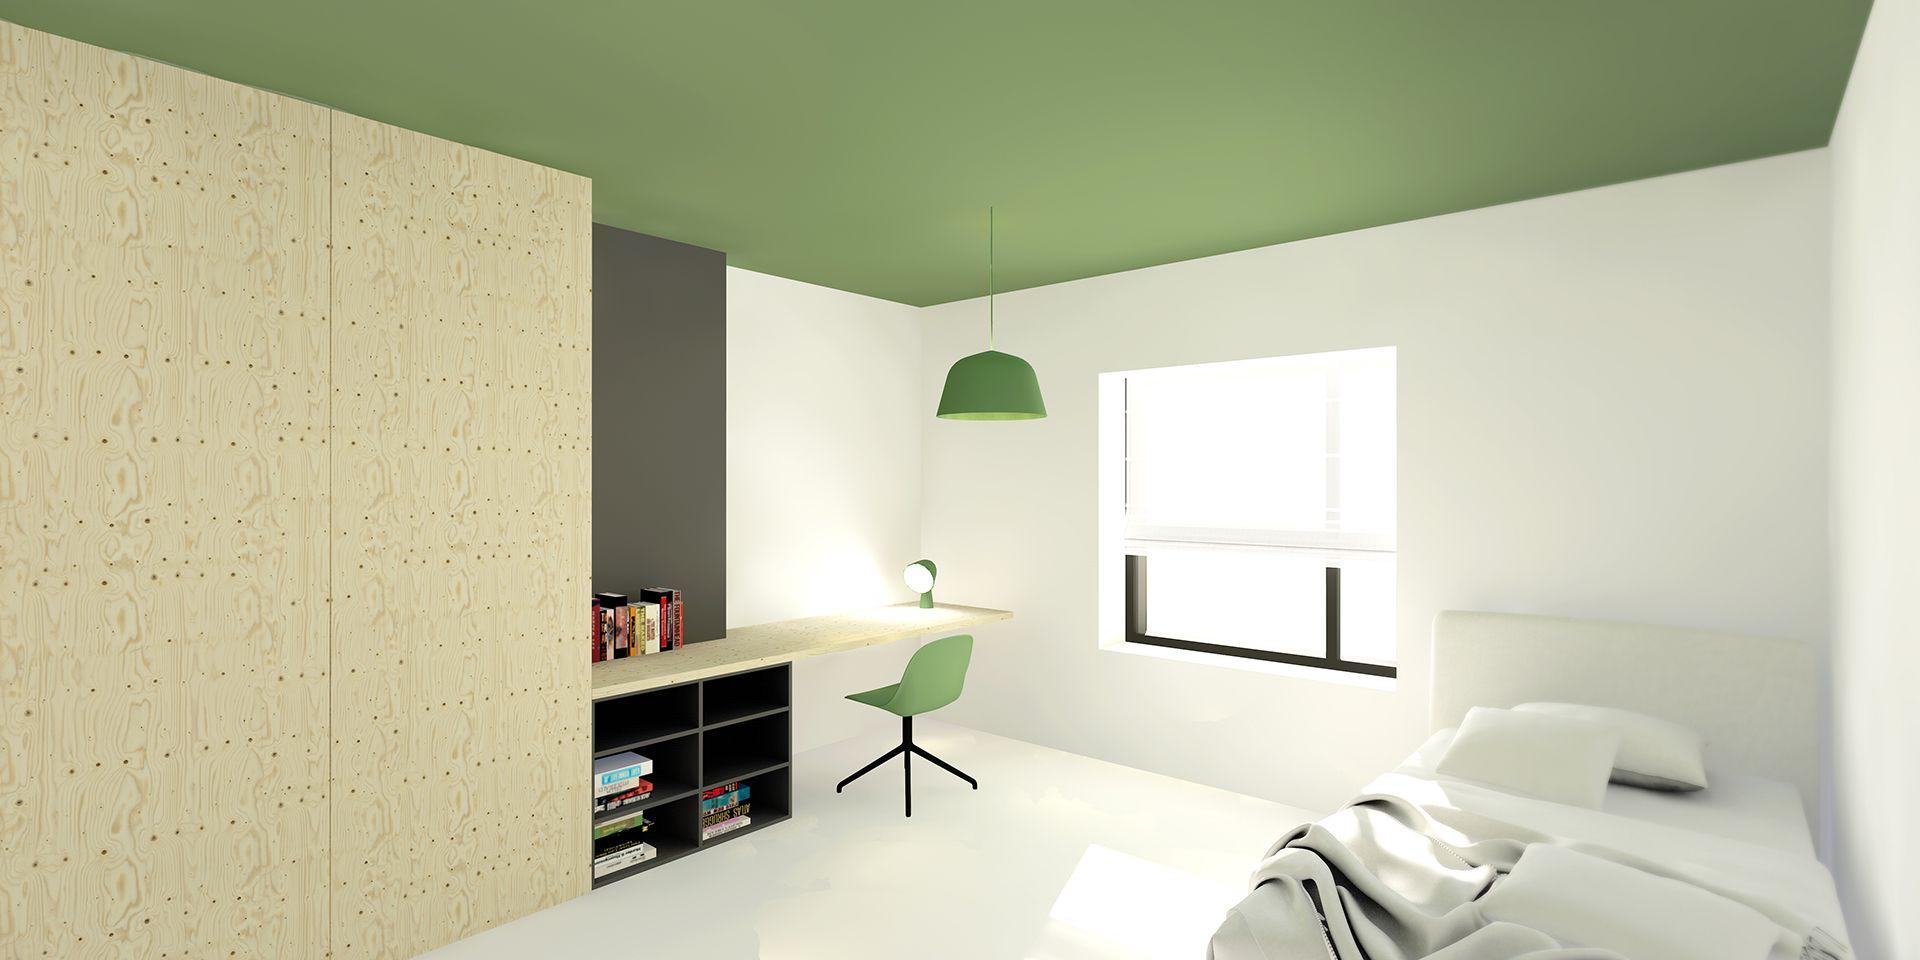 Slaapkamer #renovatie #glas #hout #plywood #modern #belgië #tuin ...